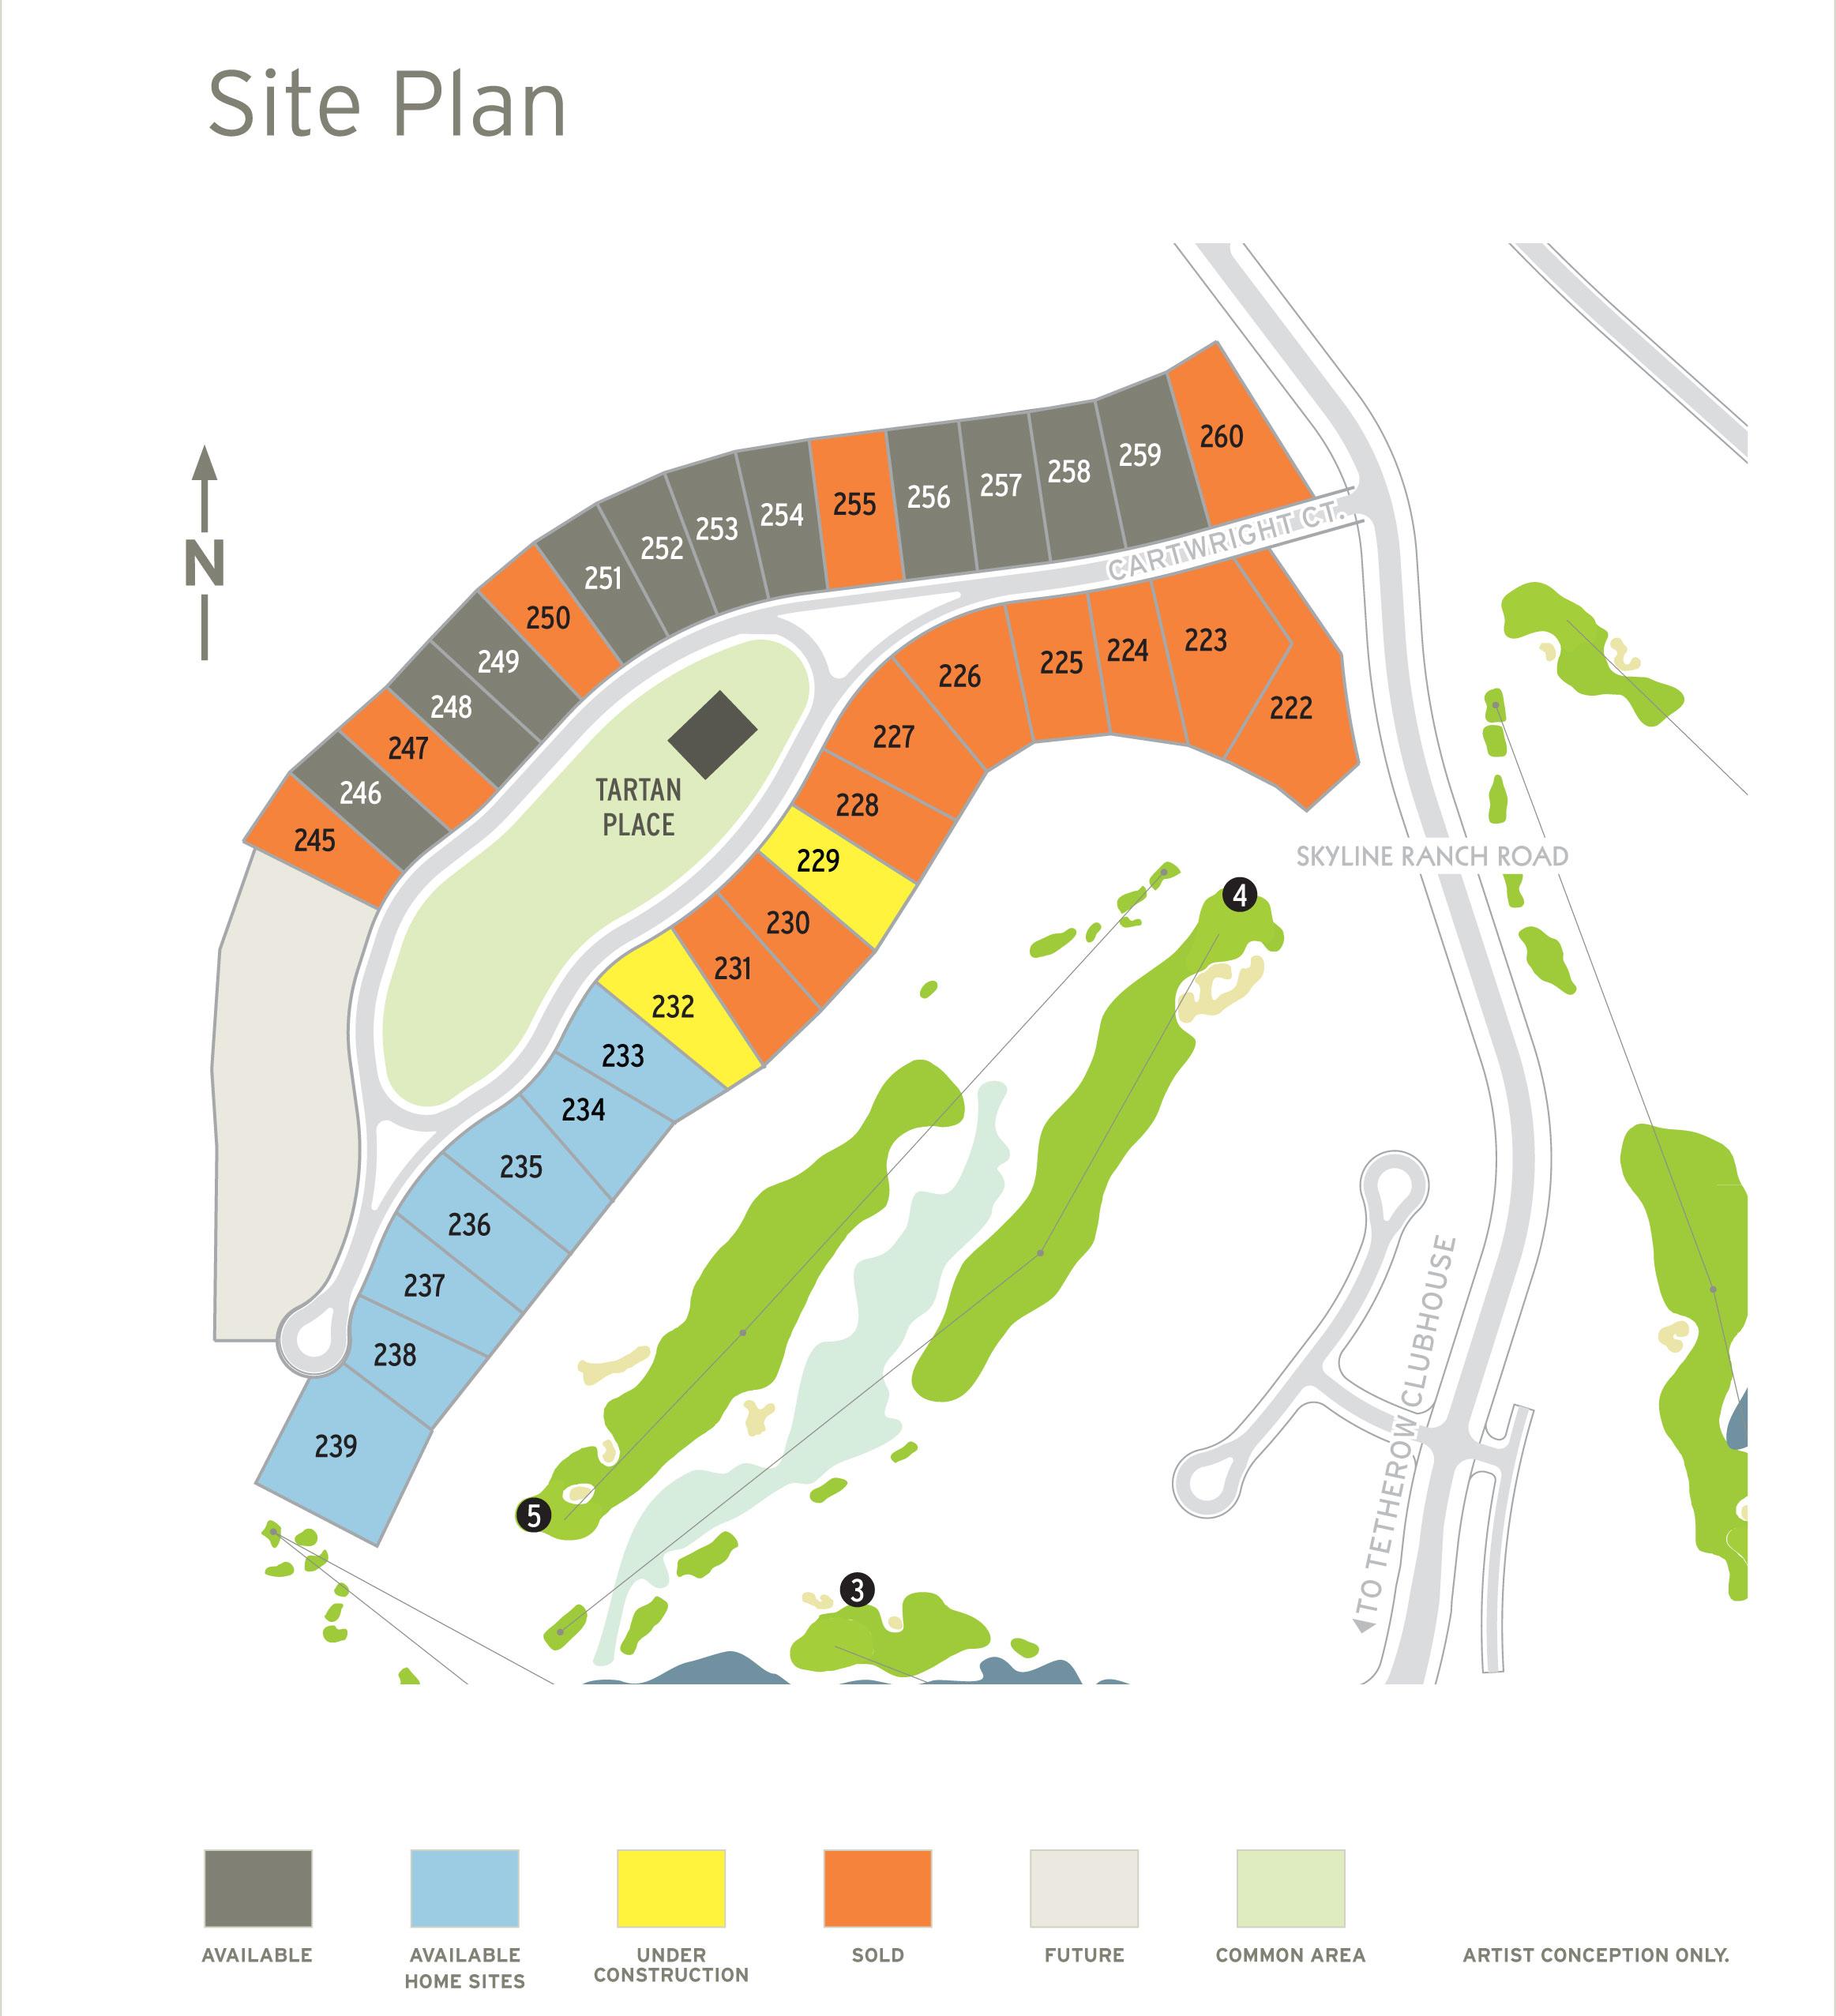 Tartan Druim at Tetherow Property Map October 19, 2018